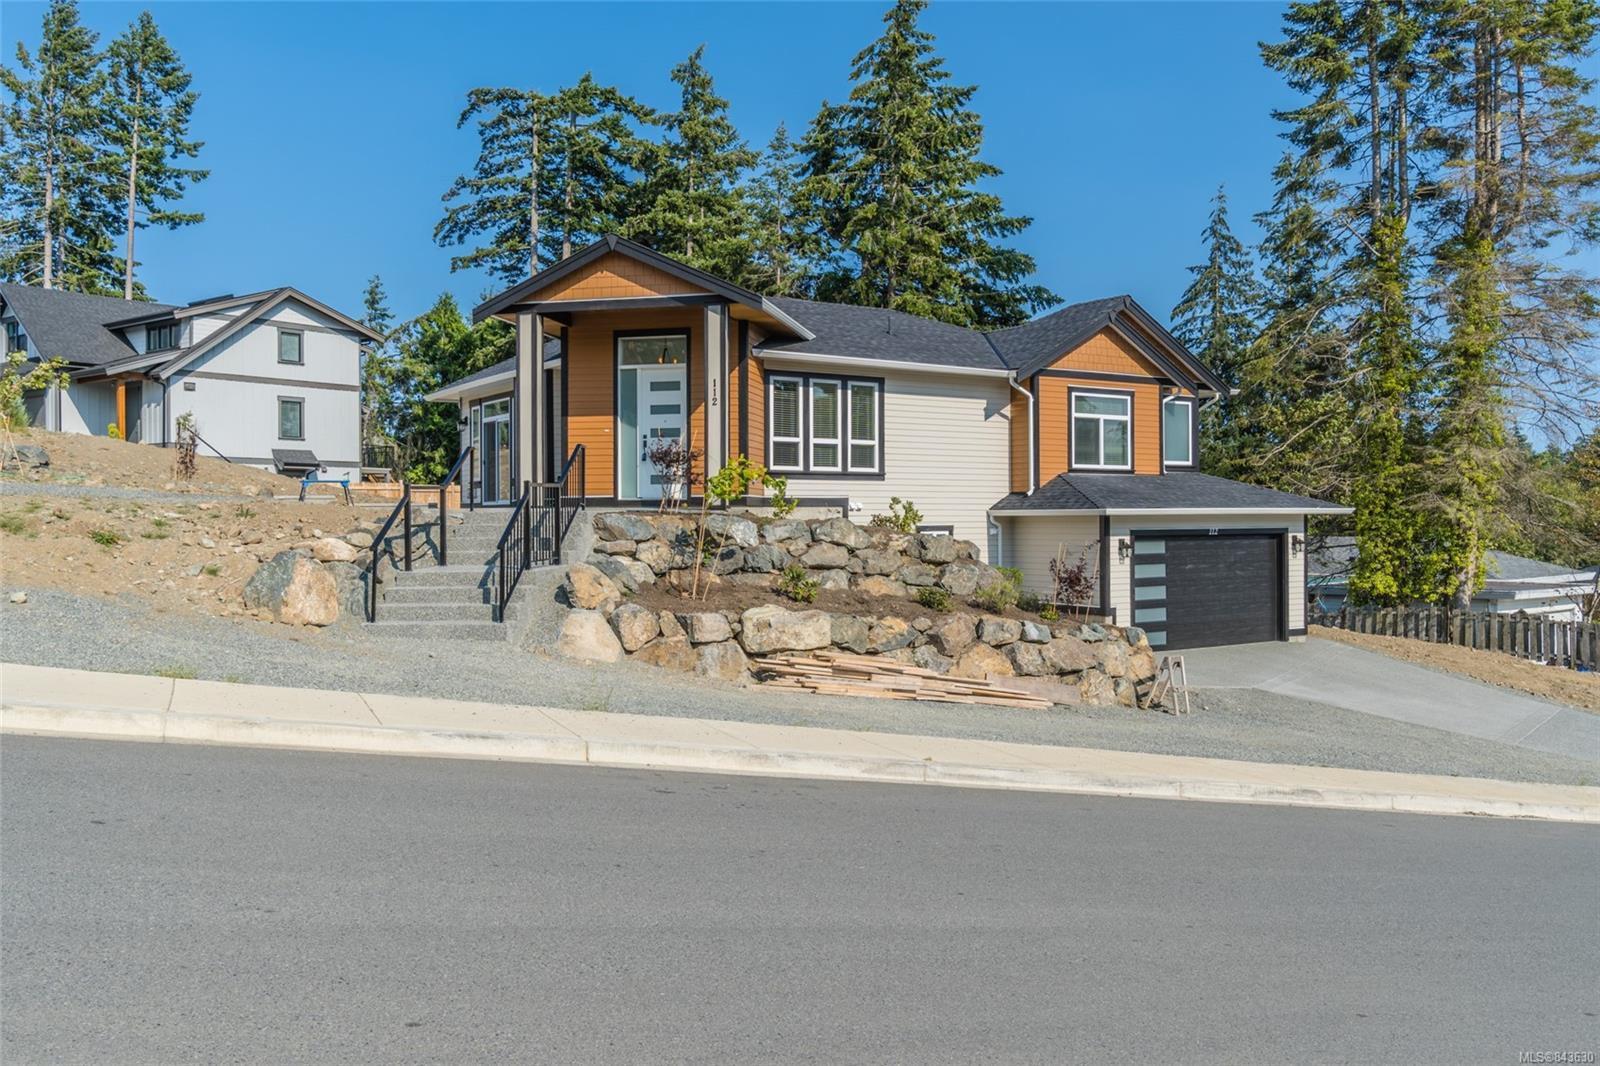 Main Photo: 112 Golden Oaks Cres in NANAIMO: Na Hammond Bay House for sale (Nanaimo)  : MLS®# 843630